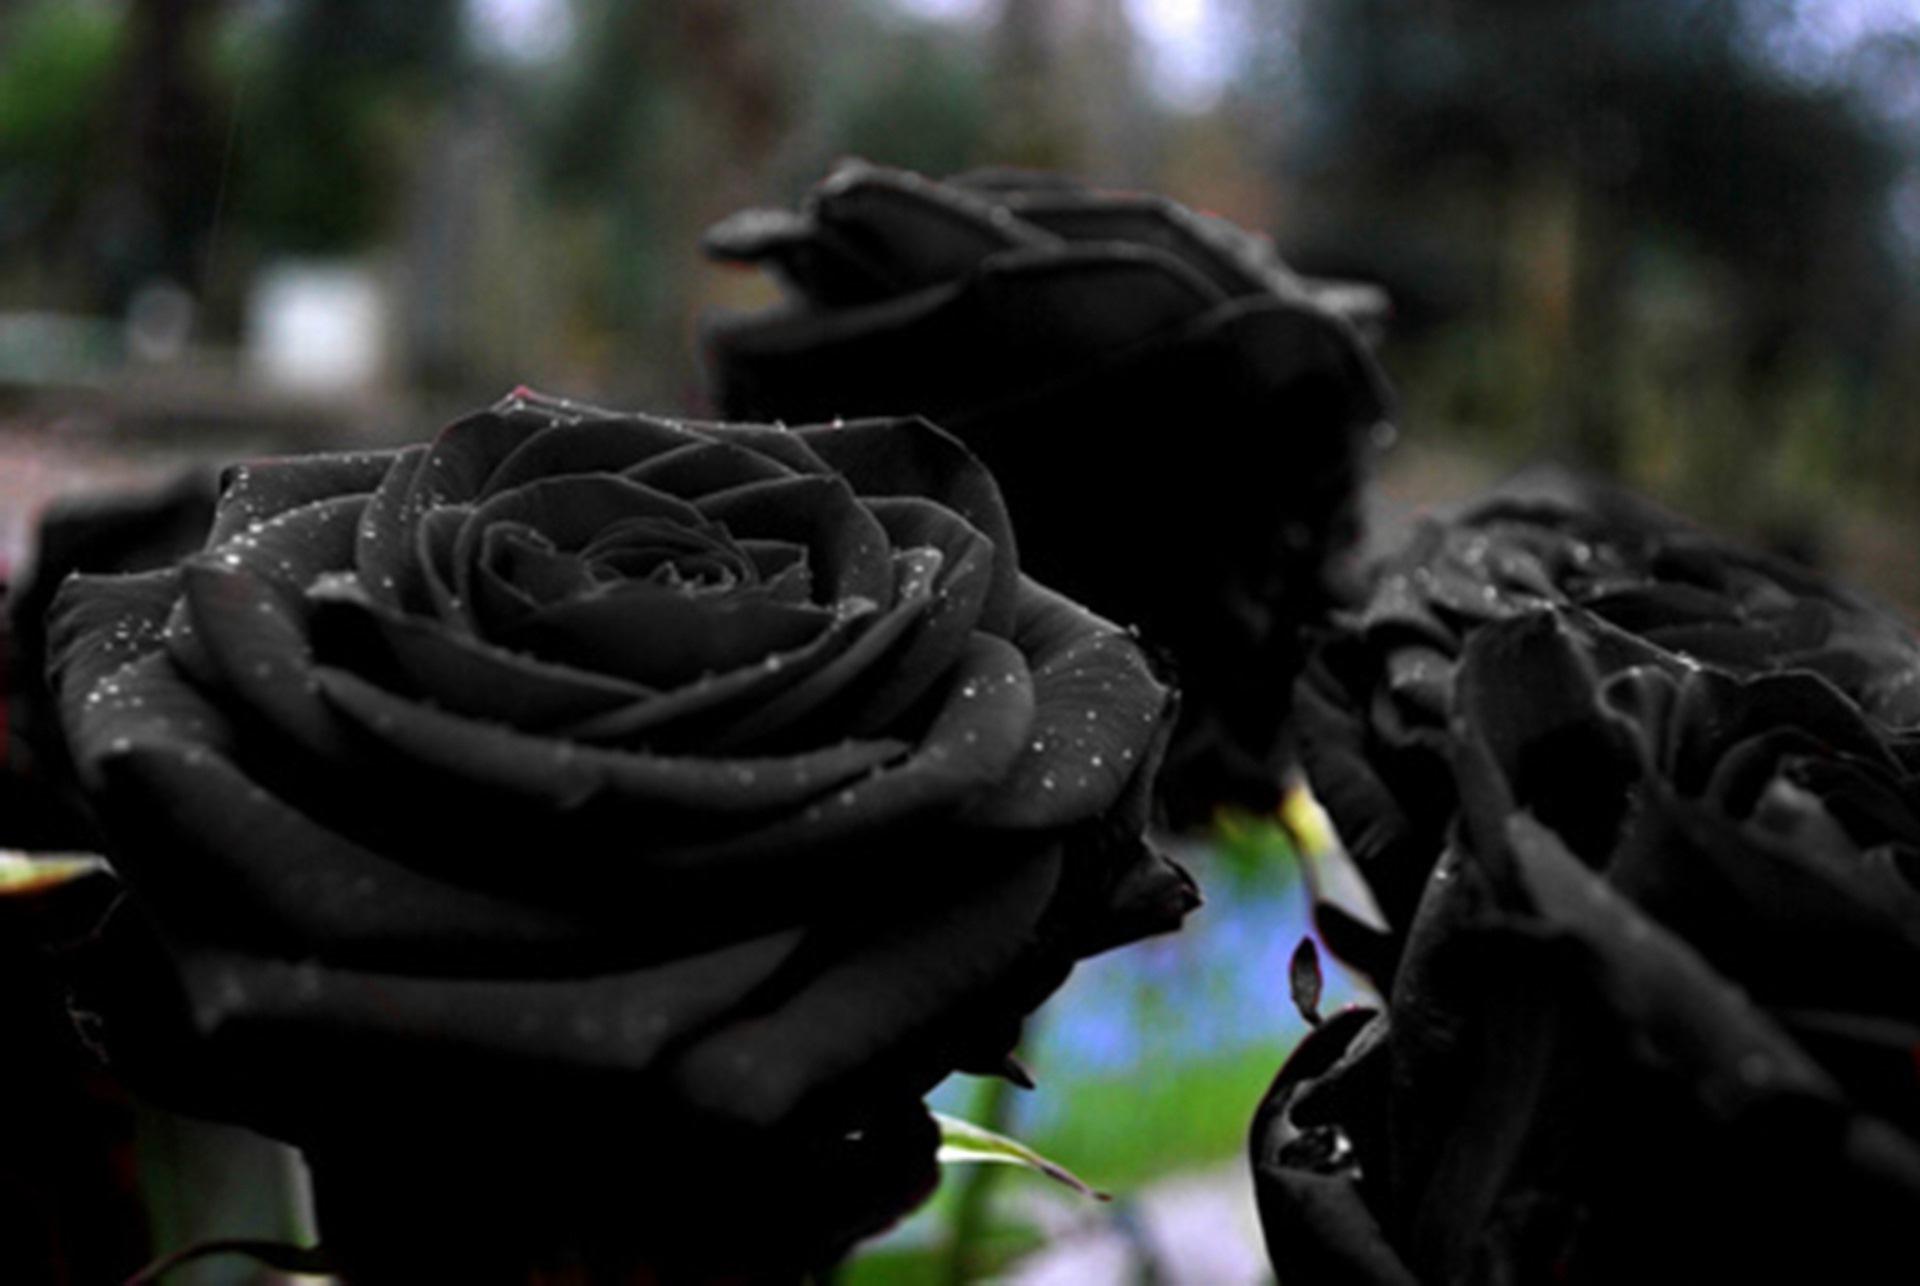 Black Rose Wallpaper Hd Black Rose 906653 Hd Wallpaper Backgrounds Download